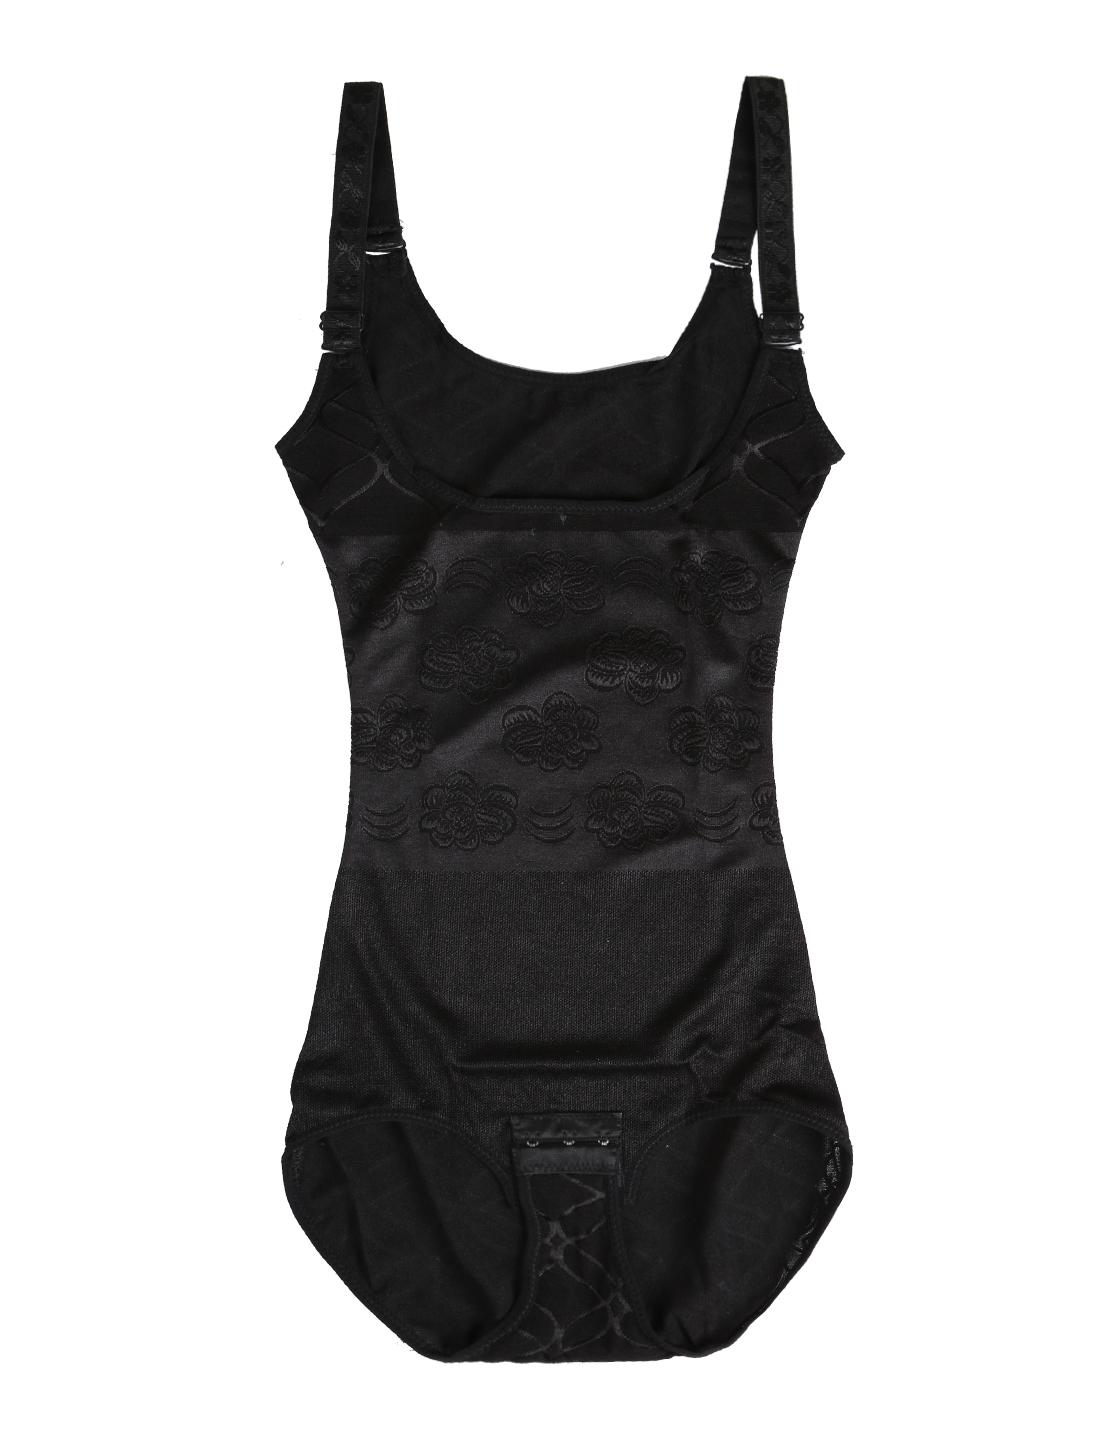 Women Seamless Front U-Style Open Bust Firm Control Shapewear Black XX-Large